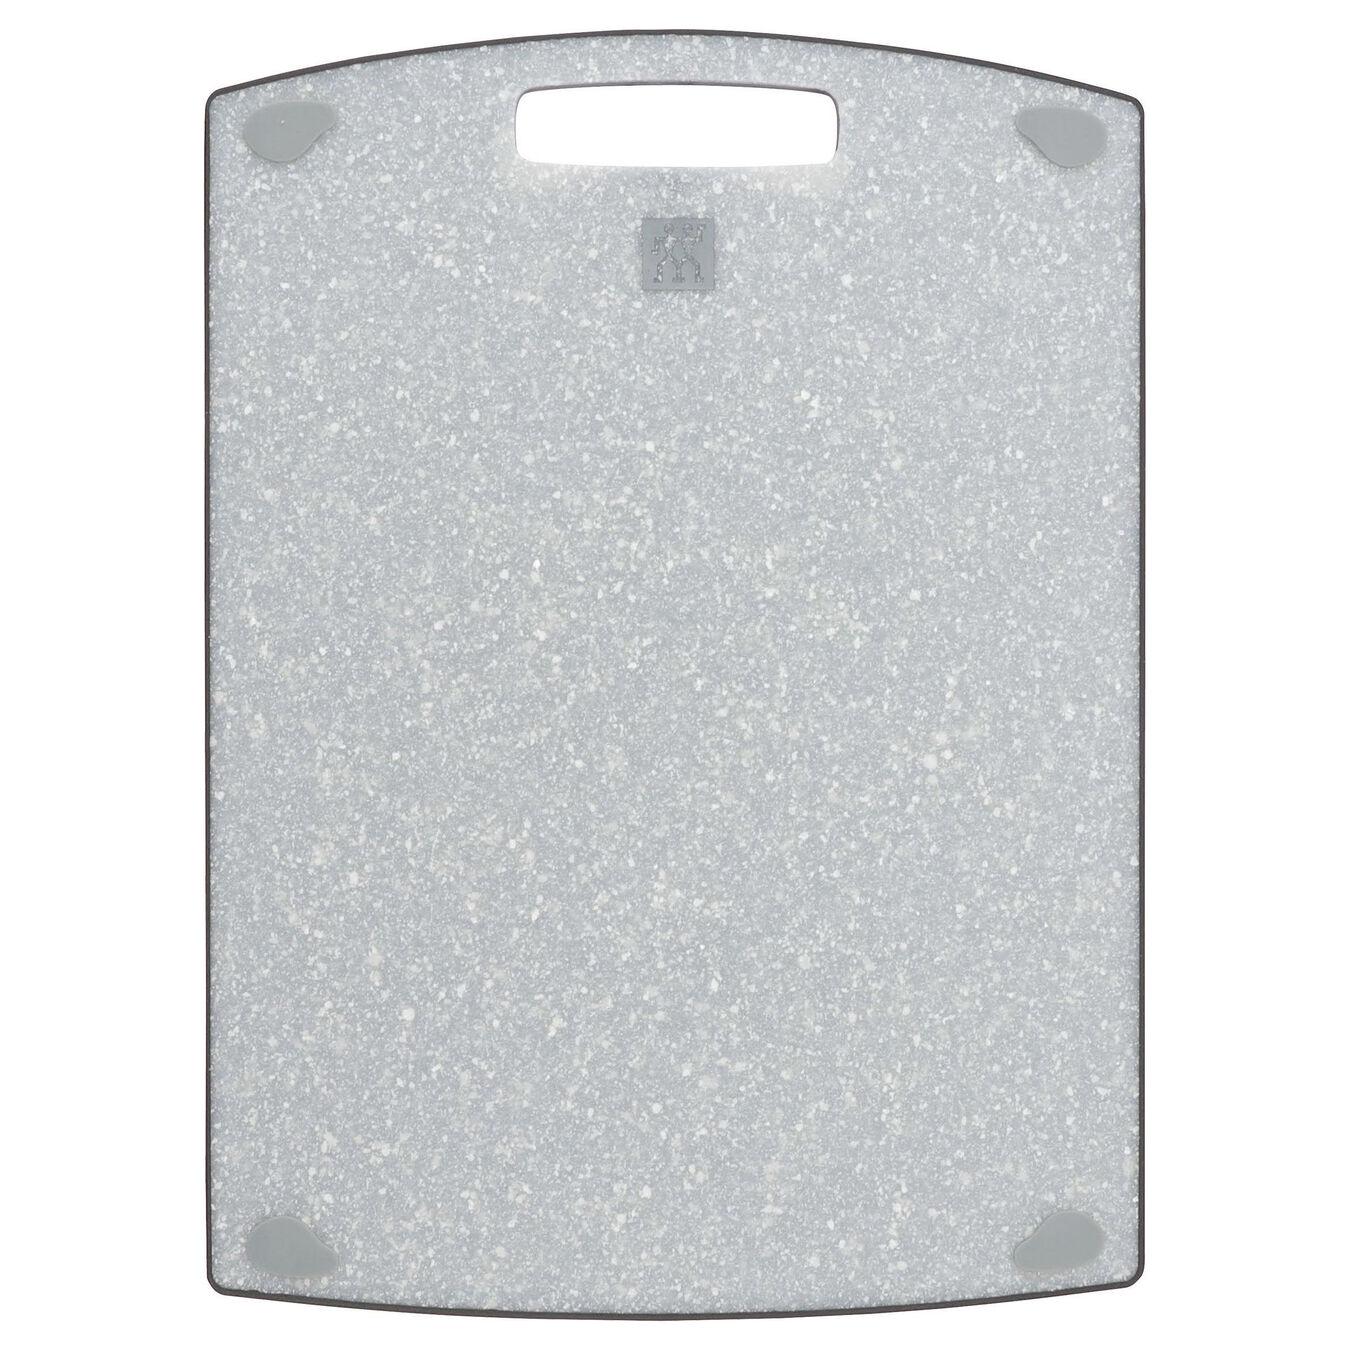 2 pc. Cutting board set, Plastic | 36 cm x 20 cm & 37 cm x 27 cm 36 cm x 20 cm Plastic,,large 5